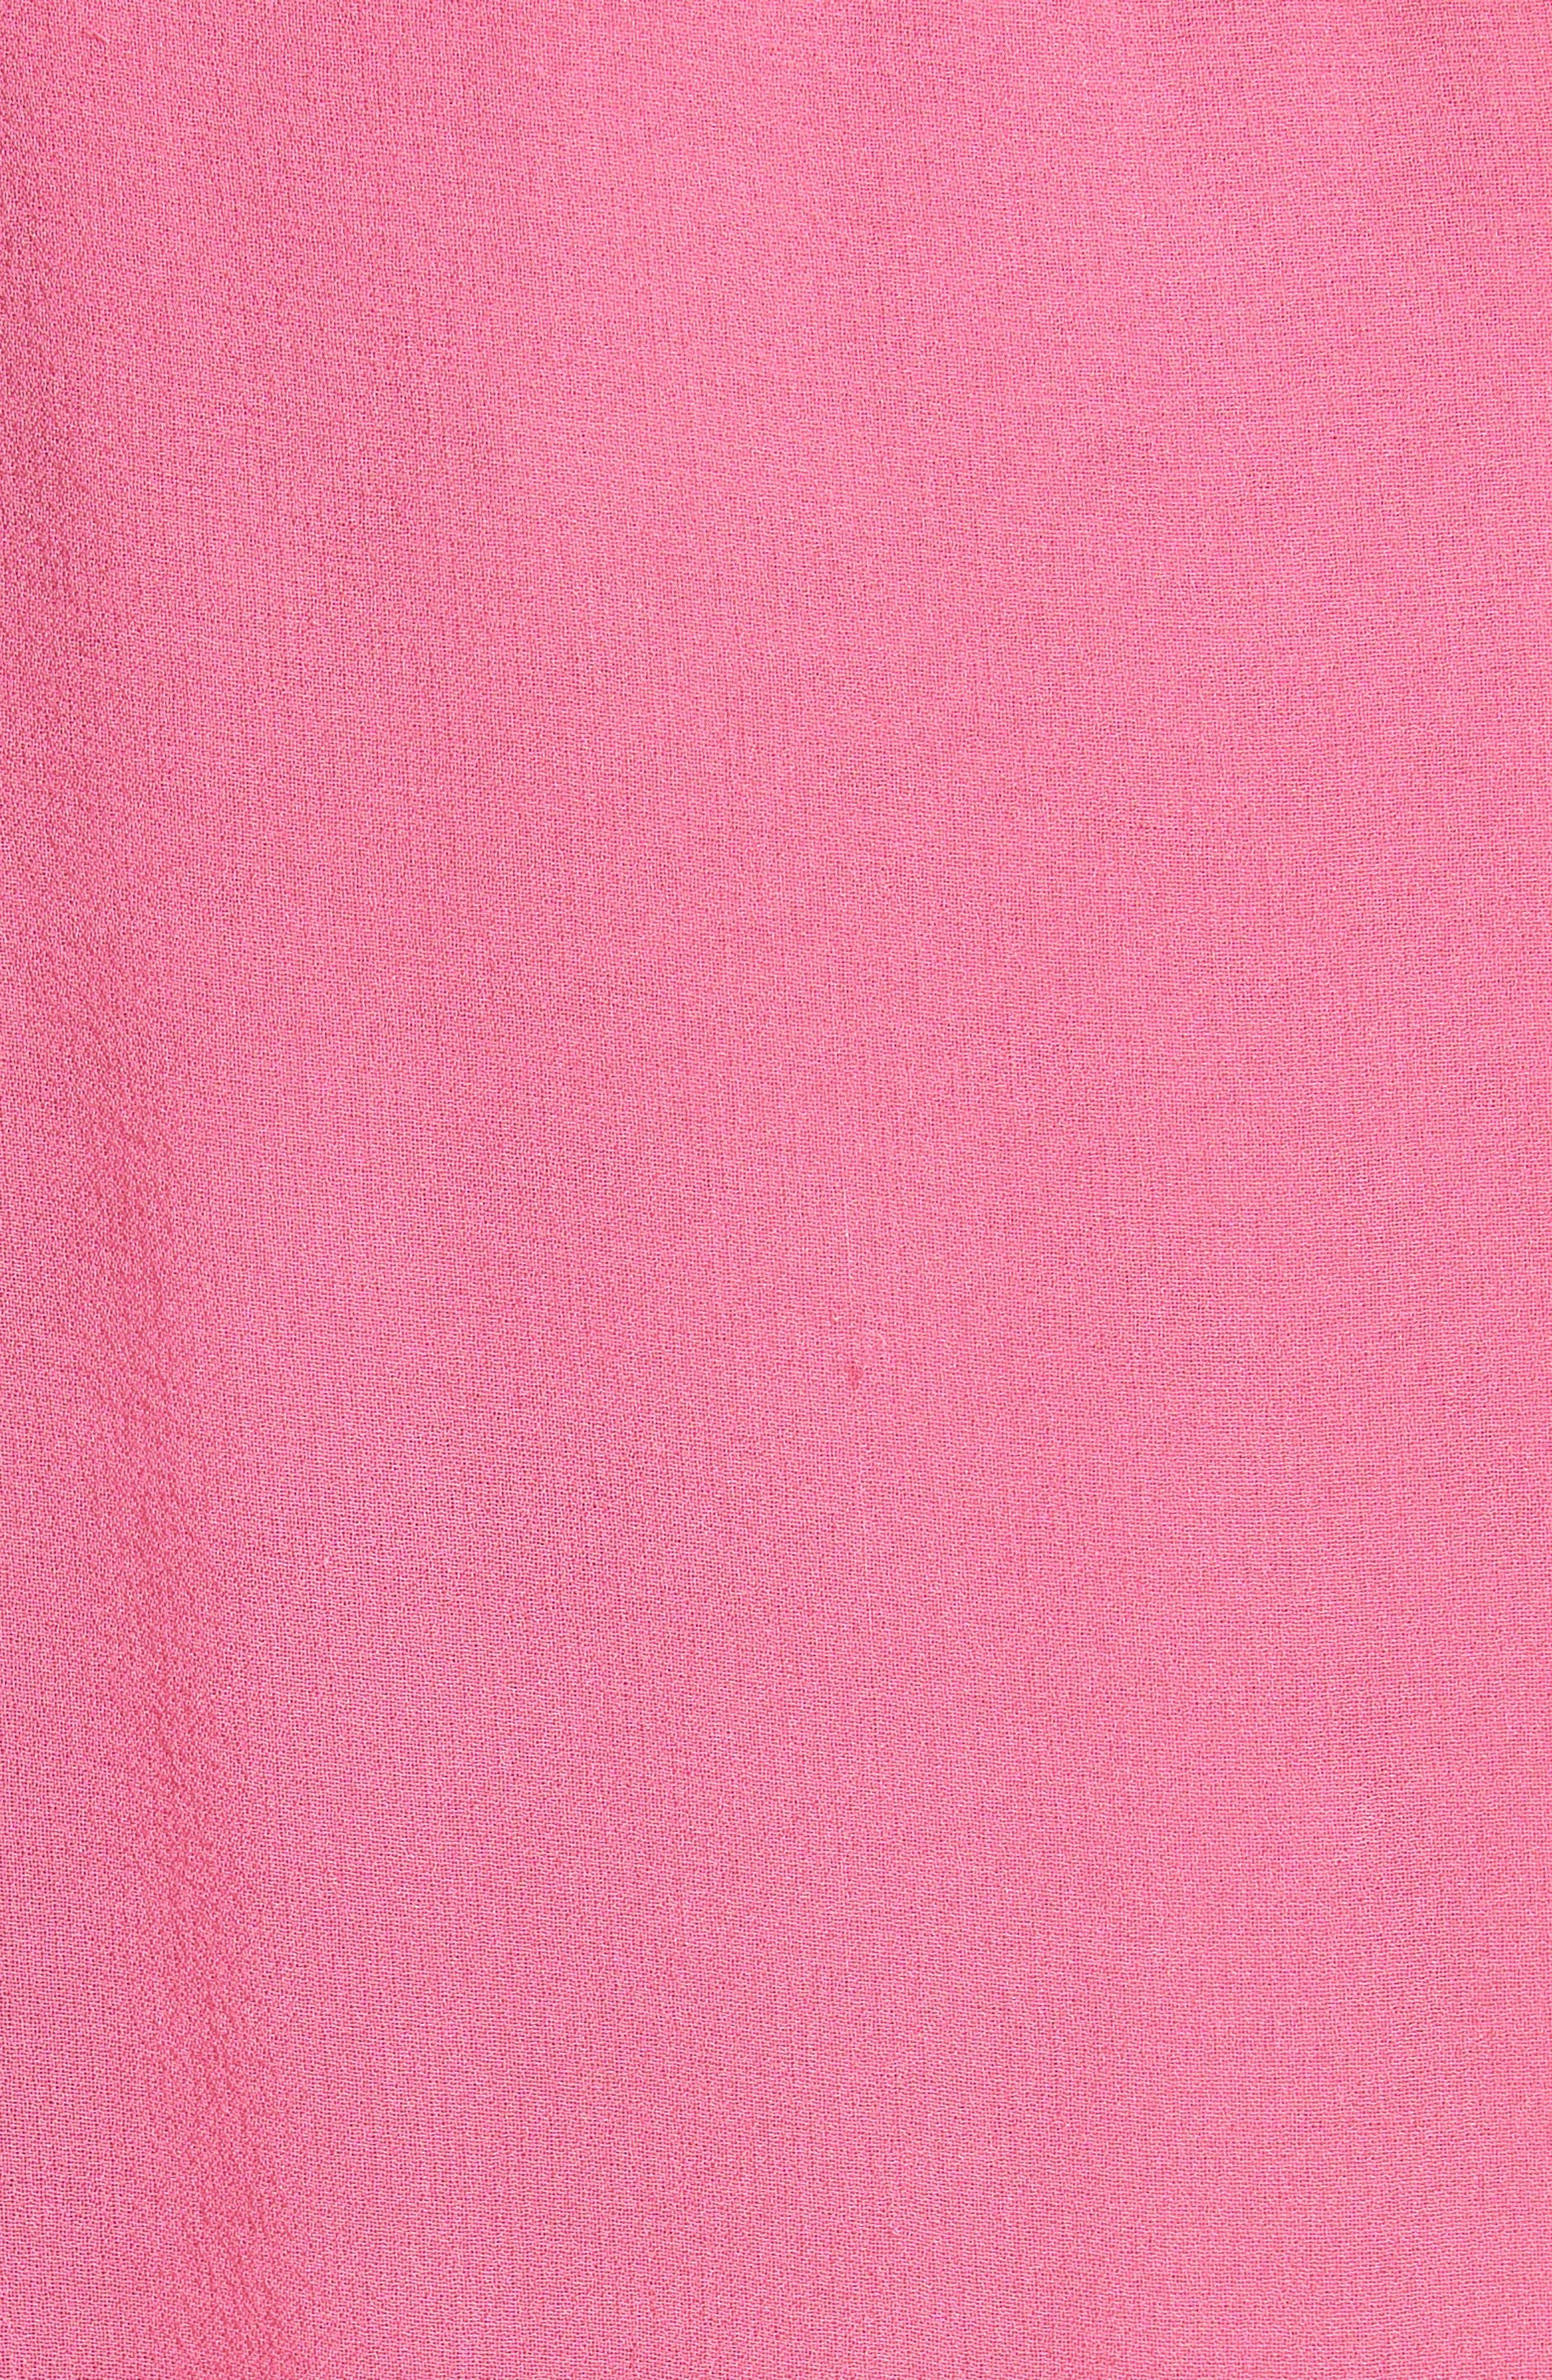 SALONI, Isa Beaded Colorblock Silk Midi Dress, Alternate thumbnail 5, color, PINK/ CHERRY